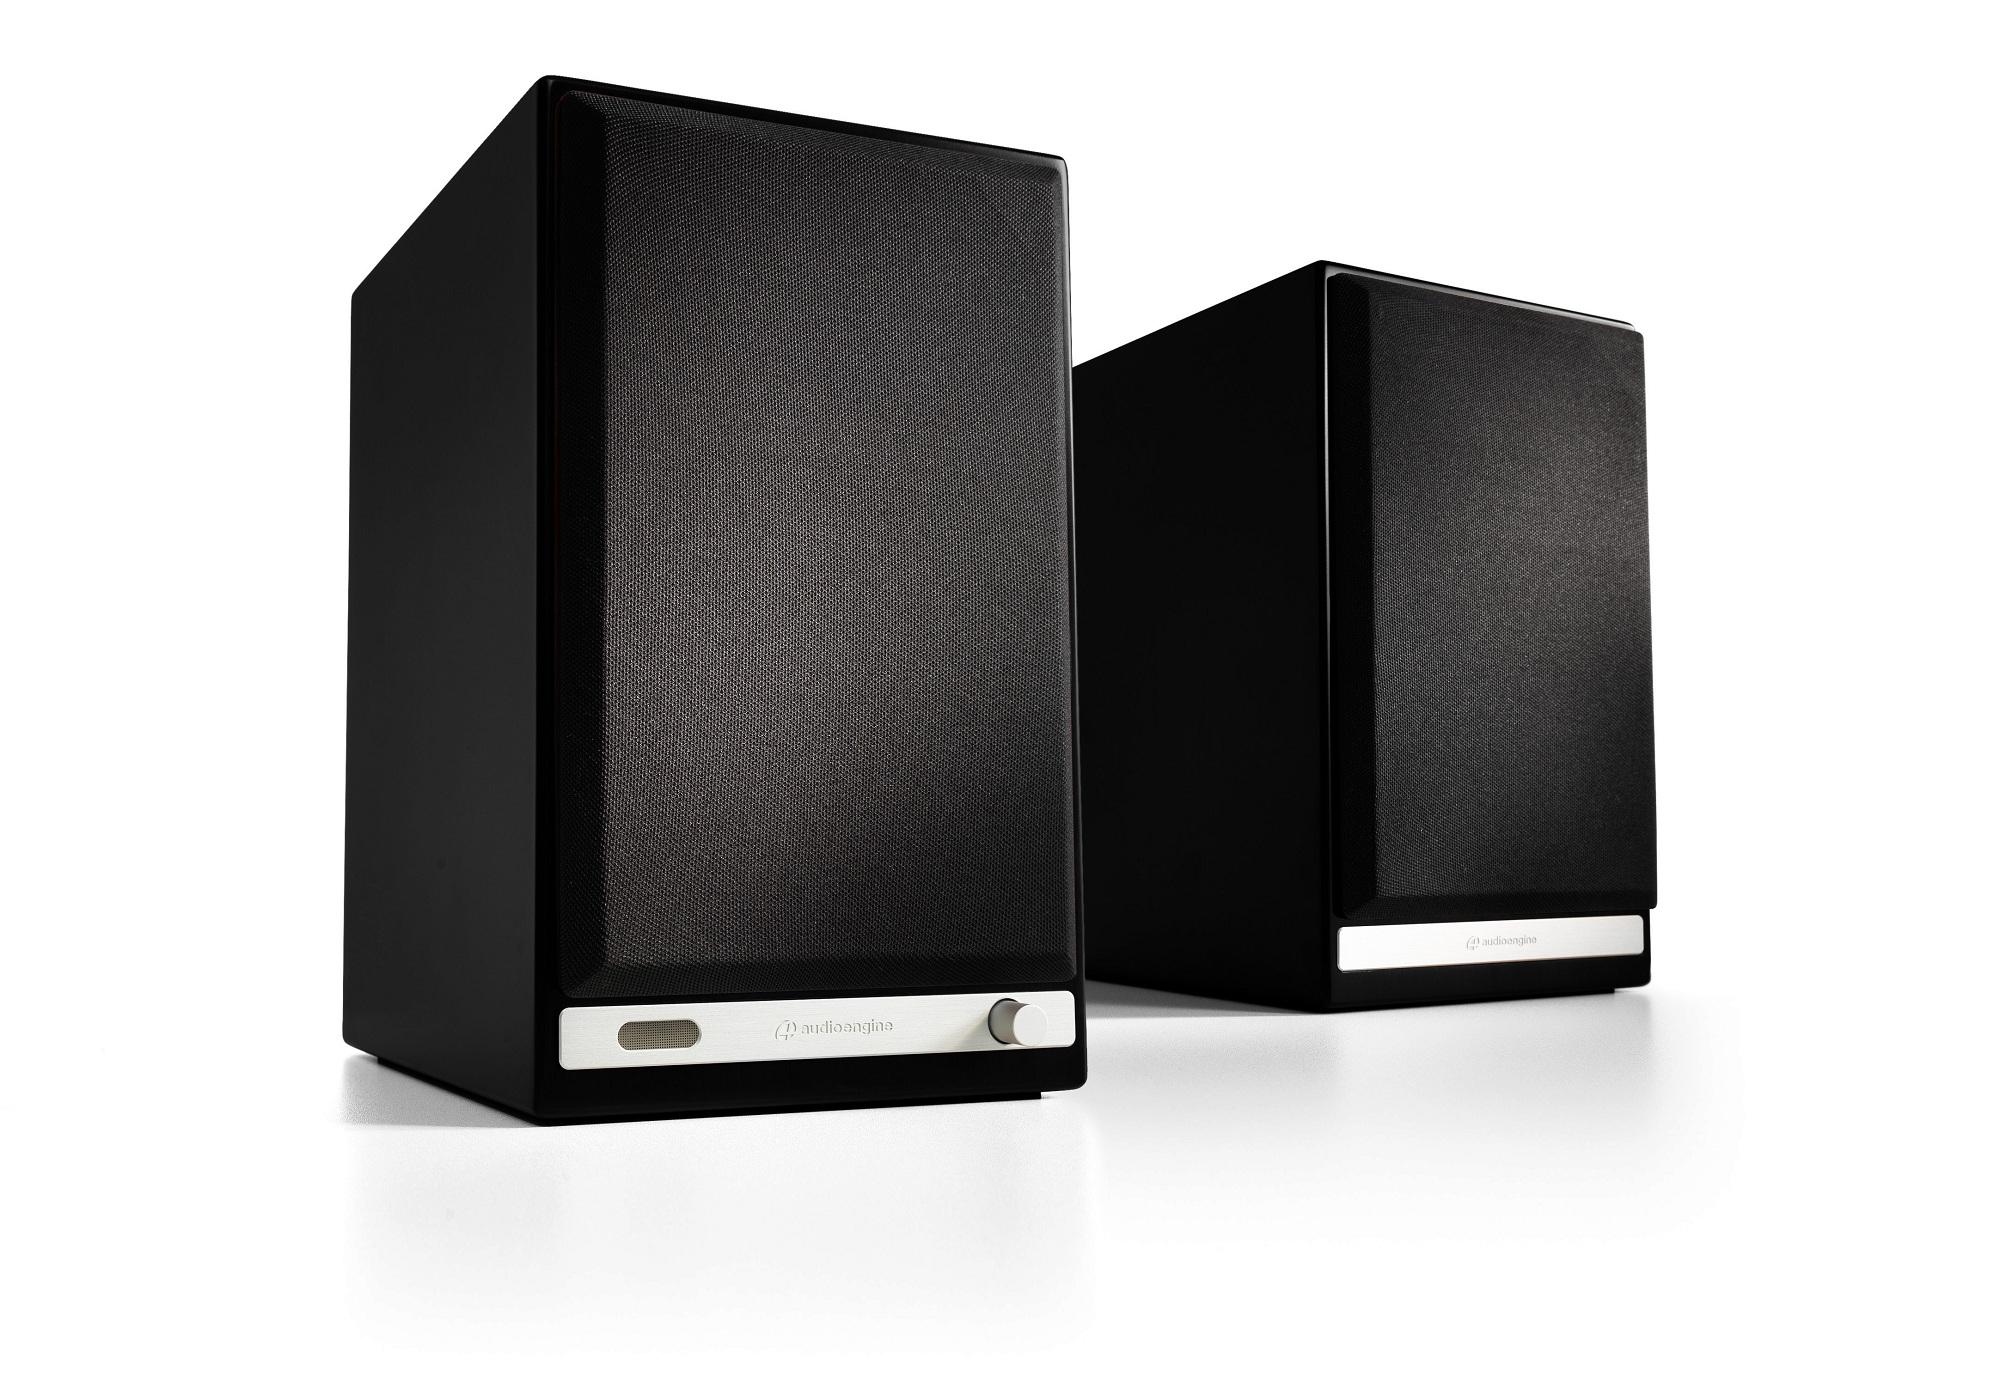 Loa Audioengine HD6 Đen